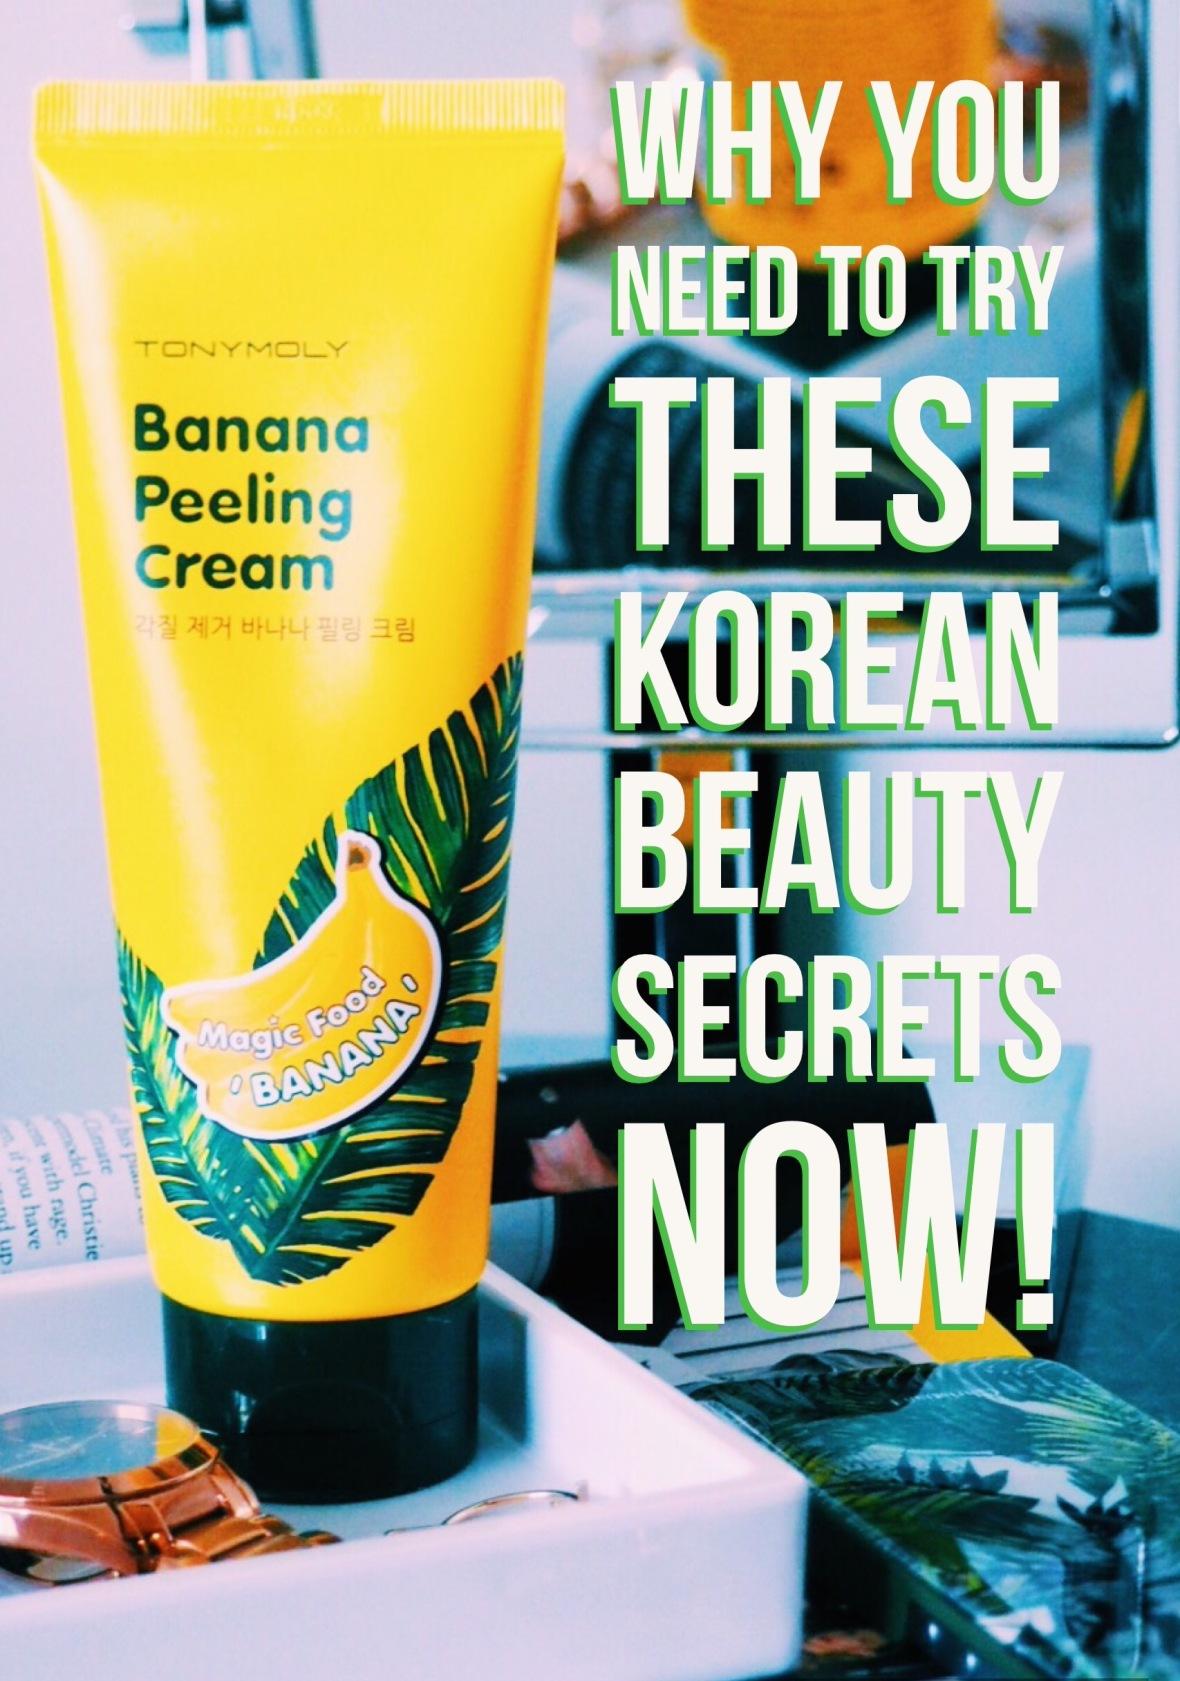 skincare, Korea, Korean beauty, tony moly, banana, cleanser, facial peel, natural skincare